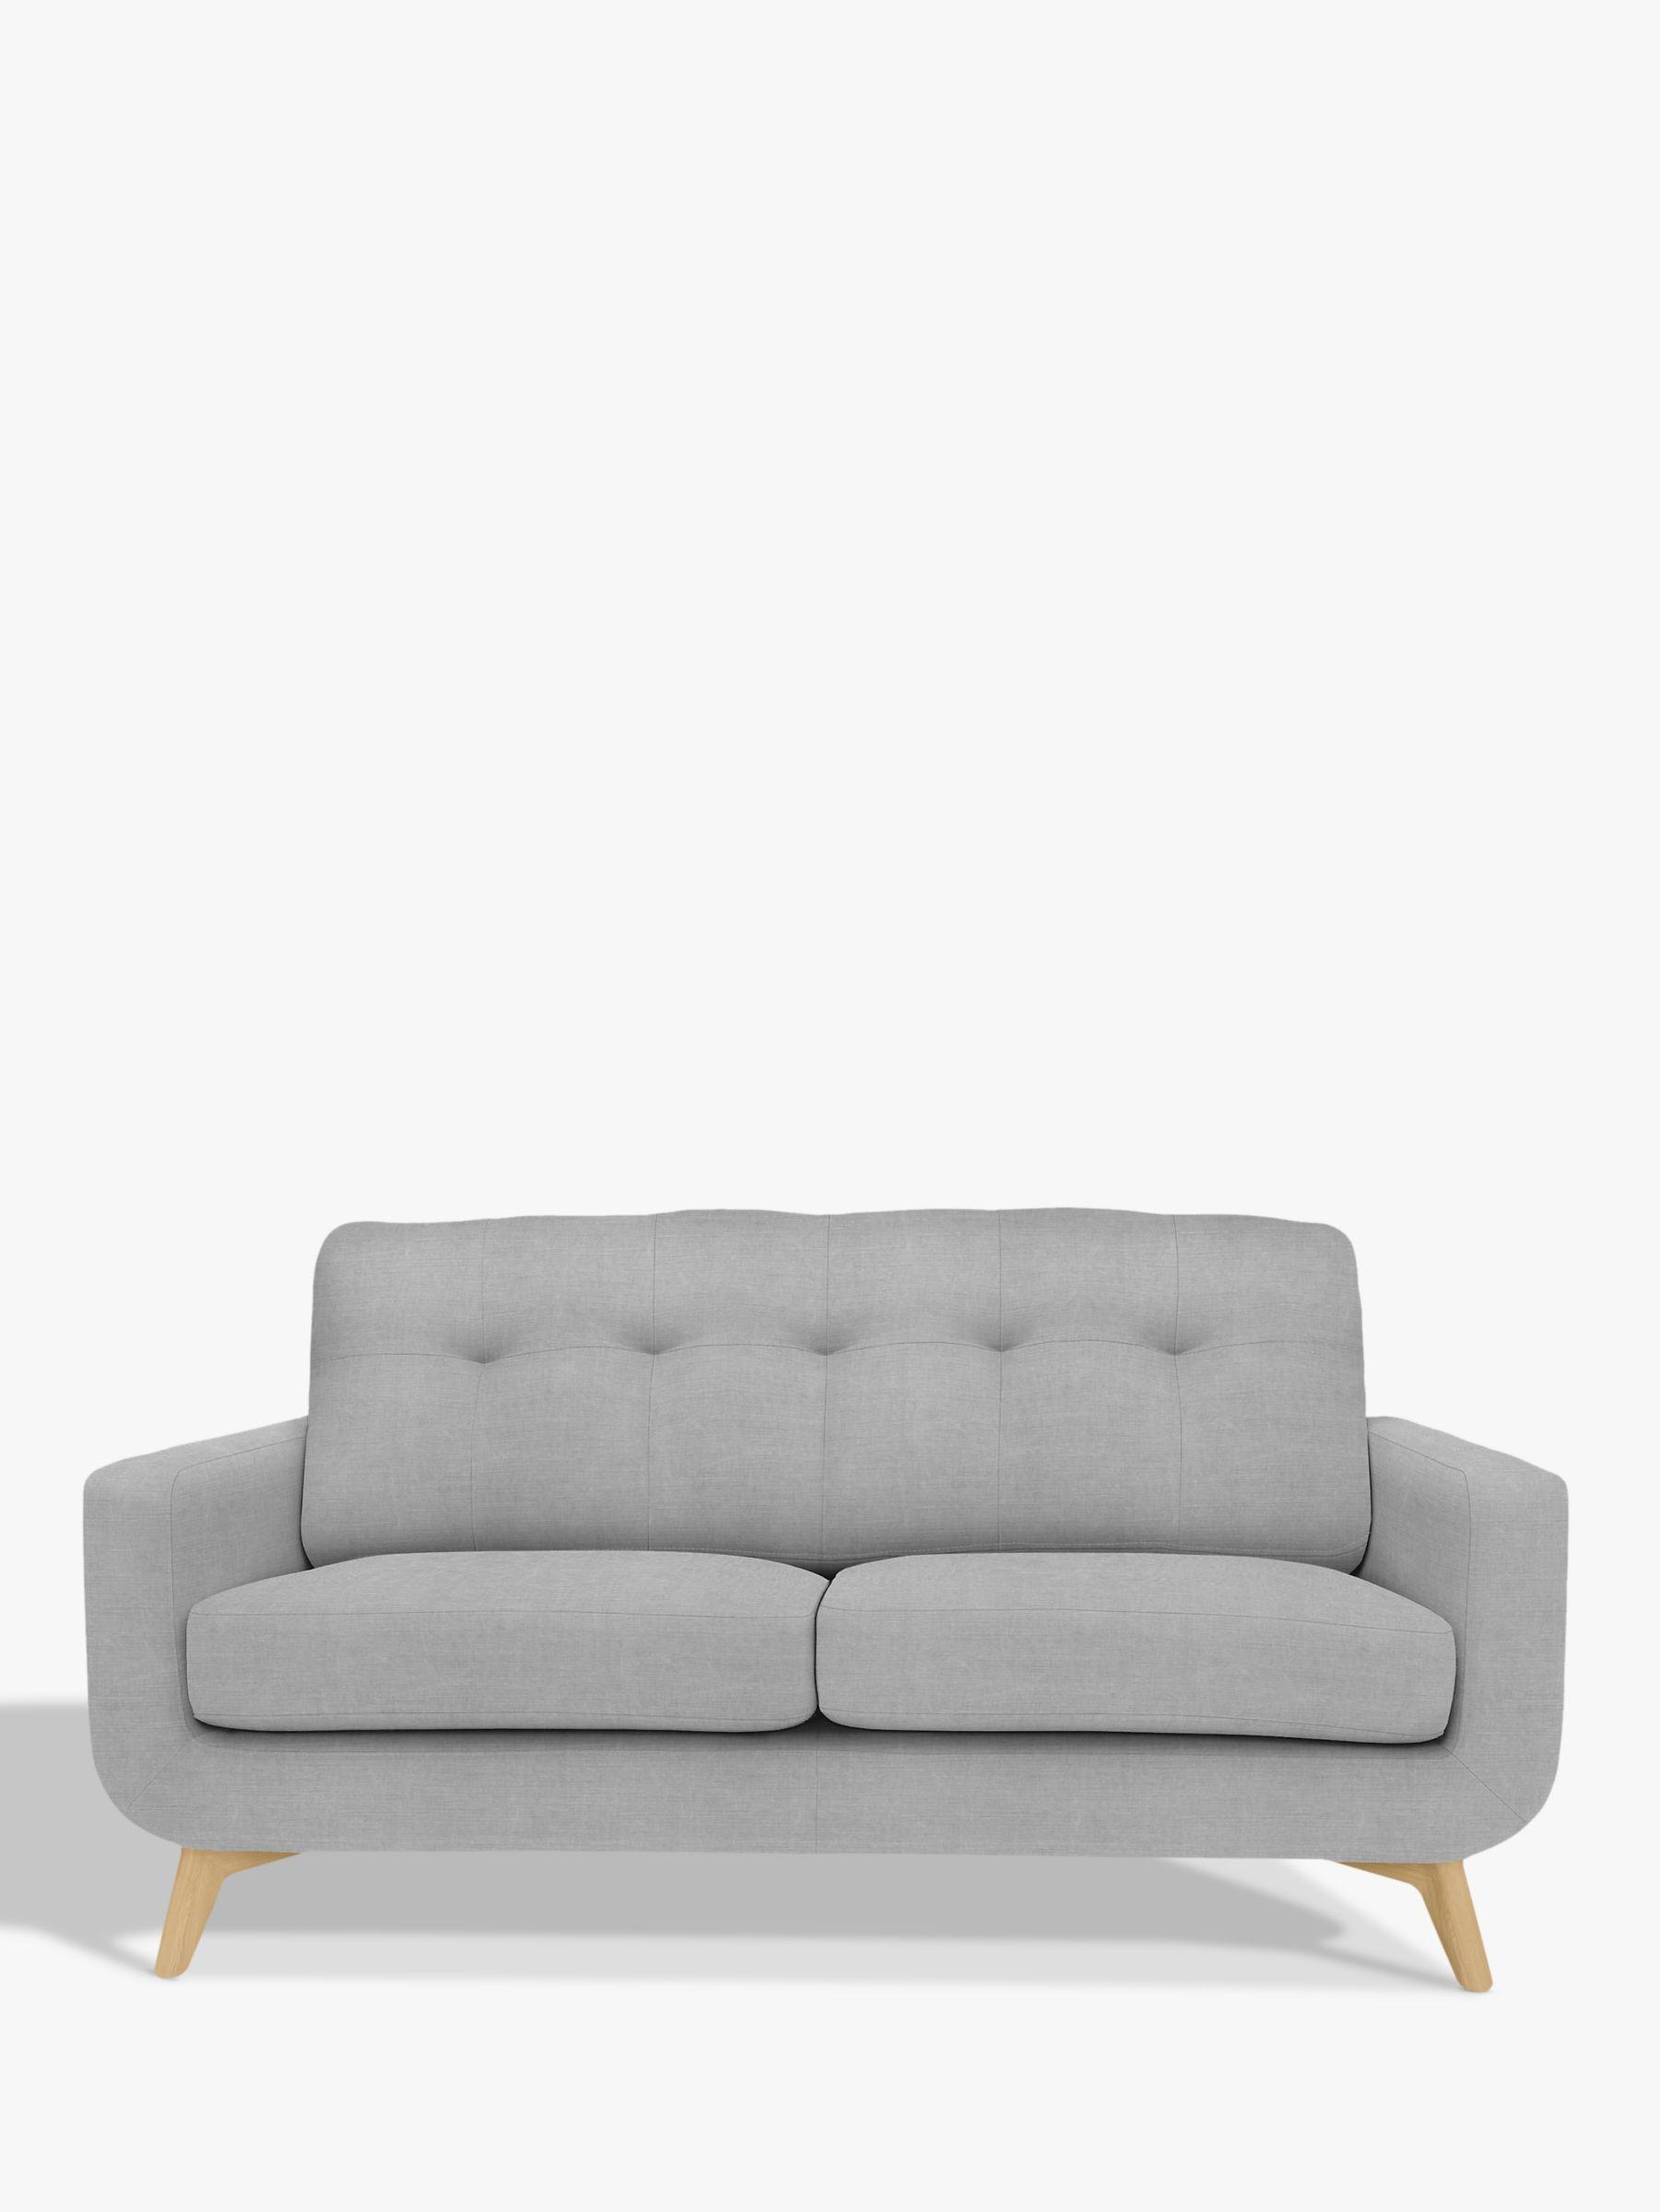 moss studio sofa reviews make your own table john lewis partners barbican medium 2 seater at buyjohn online johnlewis